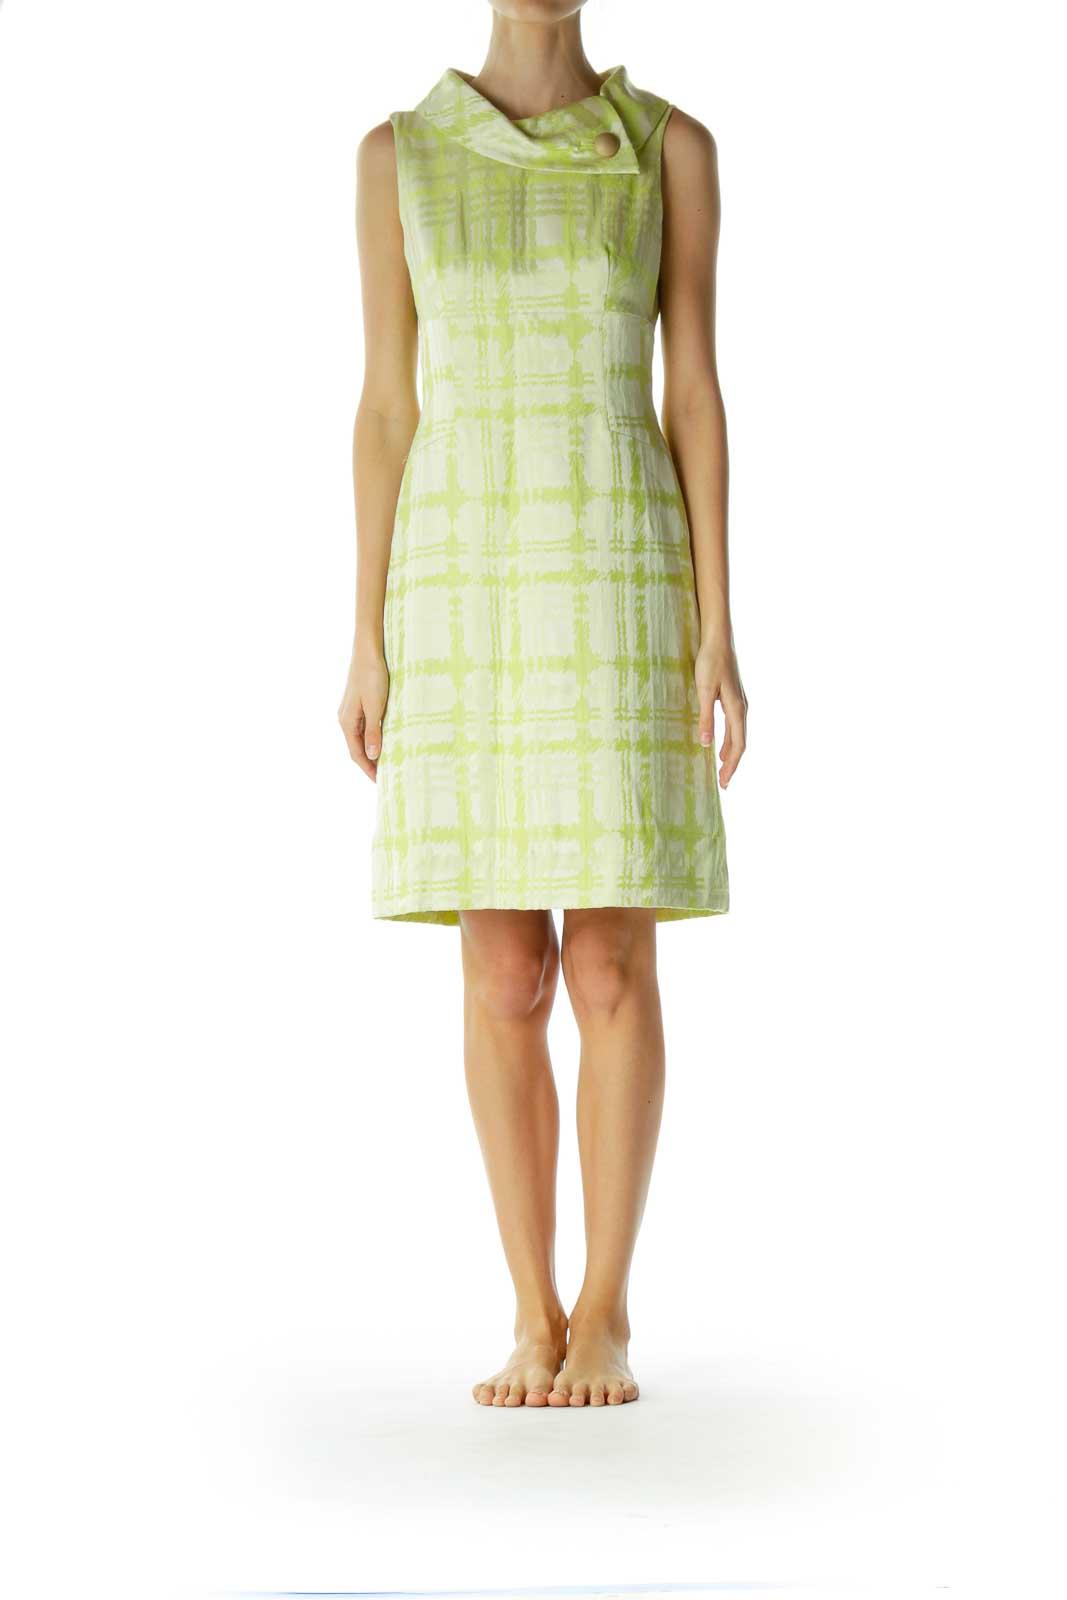 Green Cream High Neck Shiny Work Dress